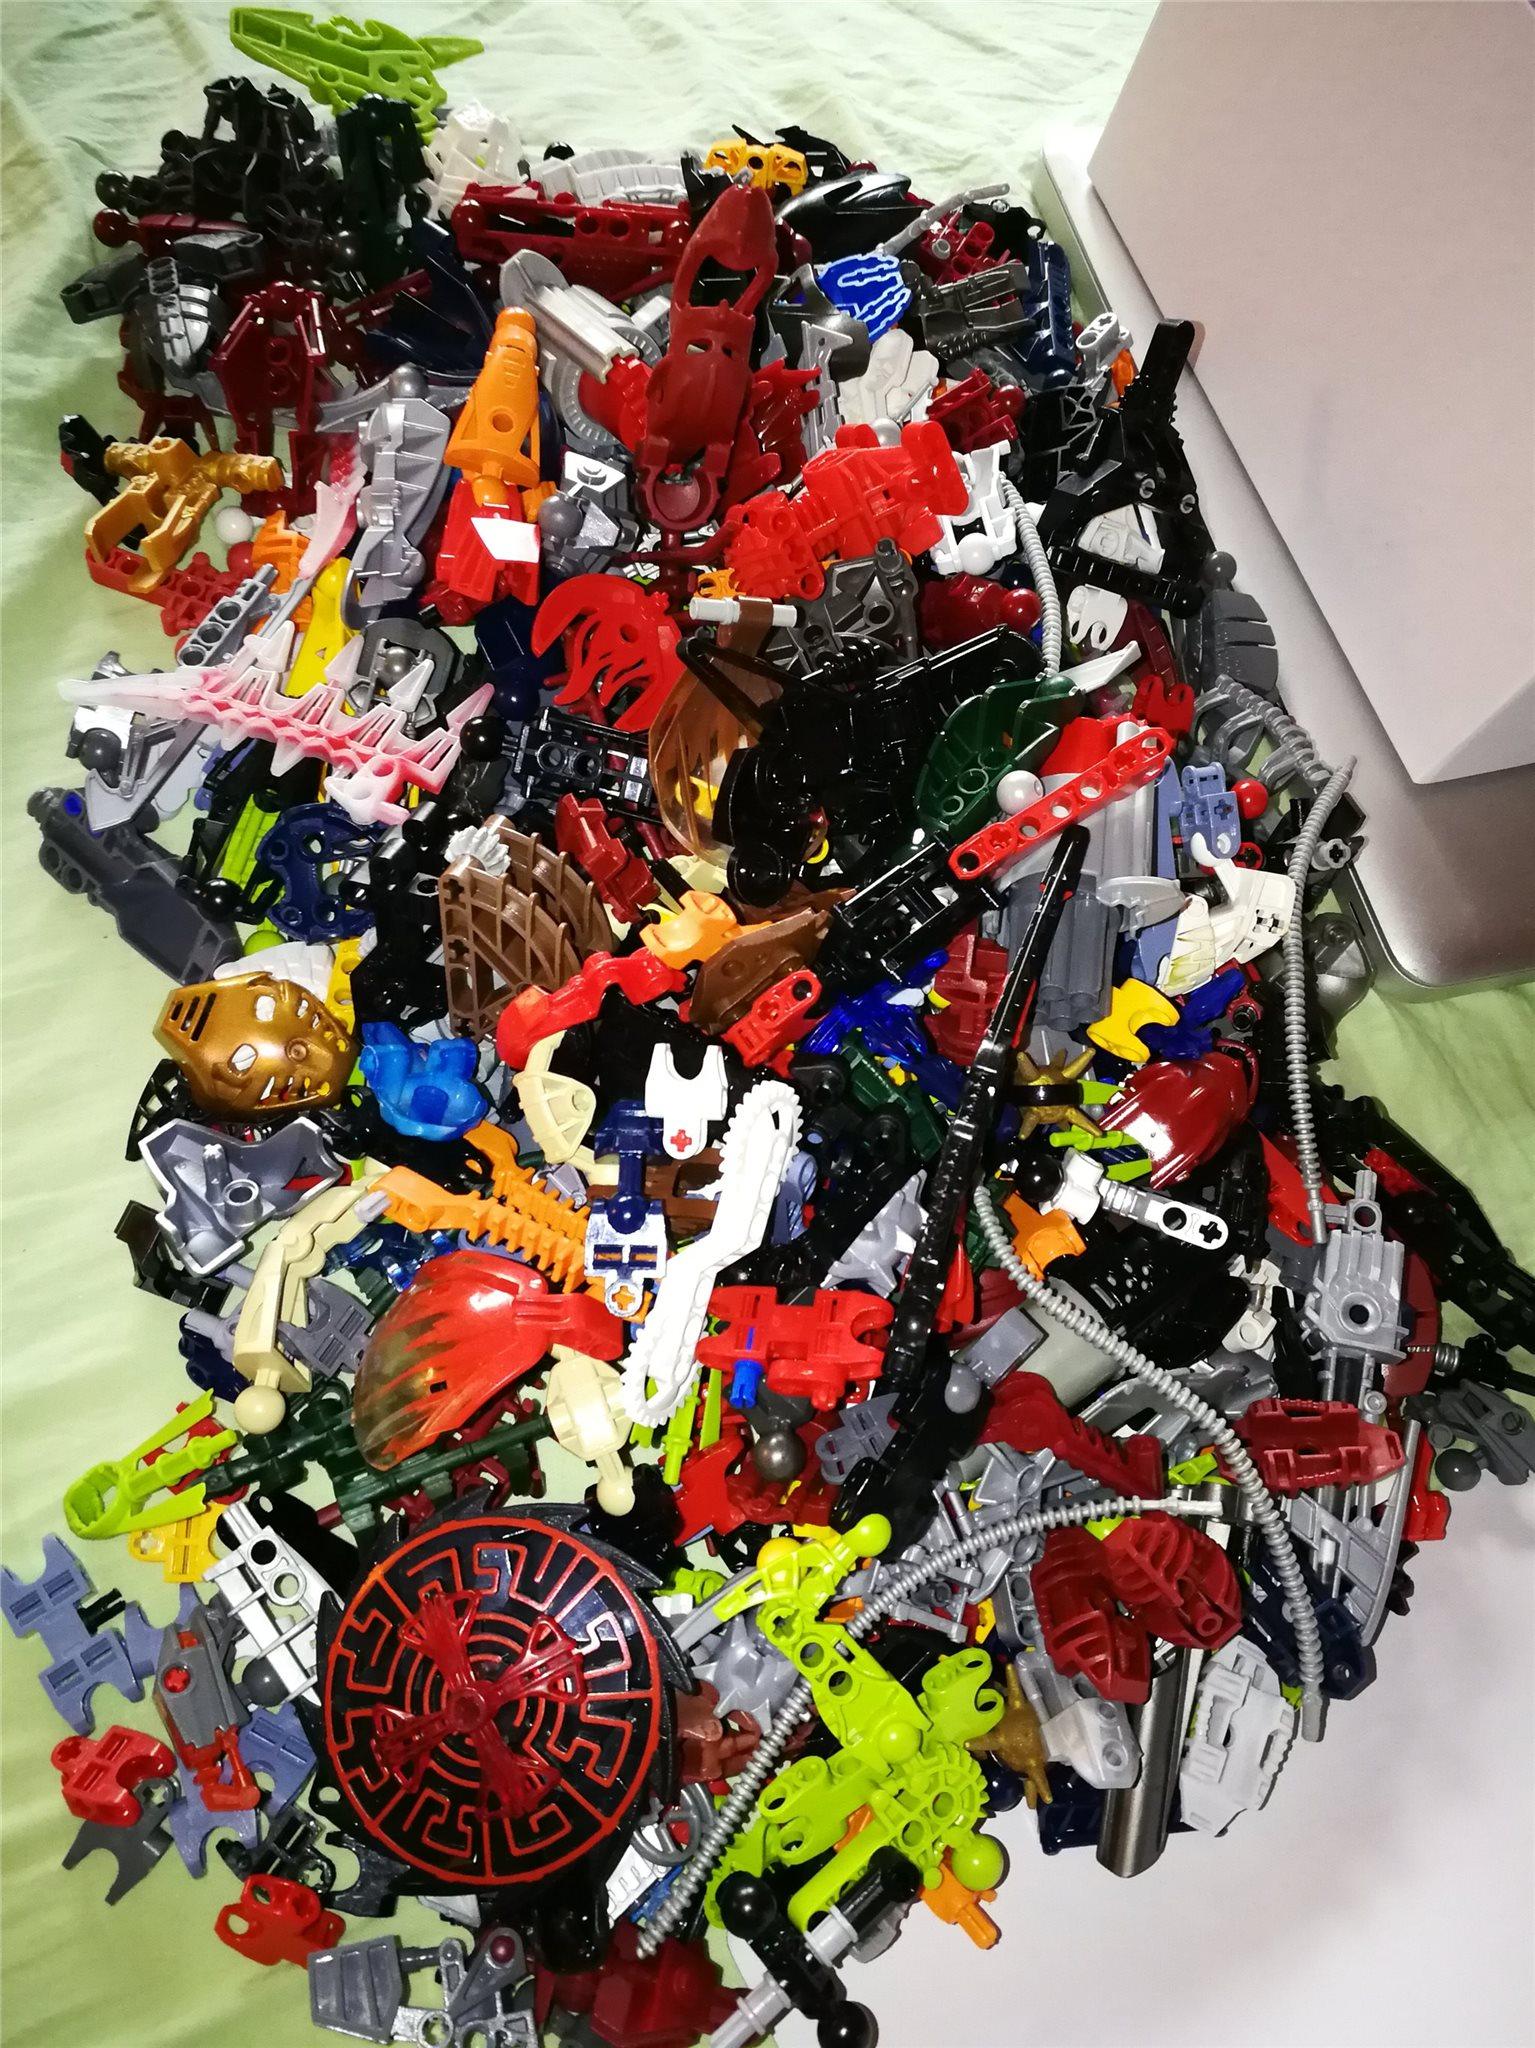 Lego Bionicle 1,8 kg Masker, vapen, fötter, ben, armar m.m Även Hero factory